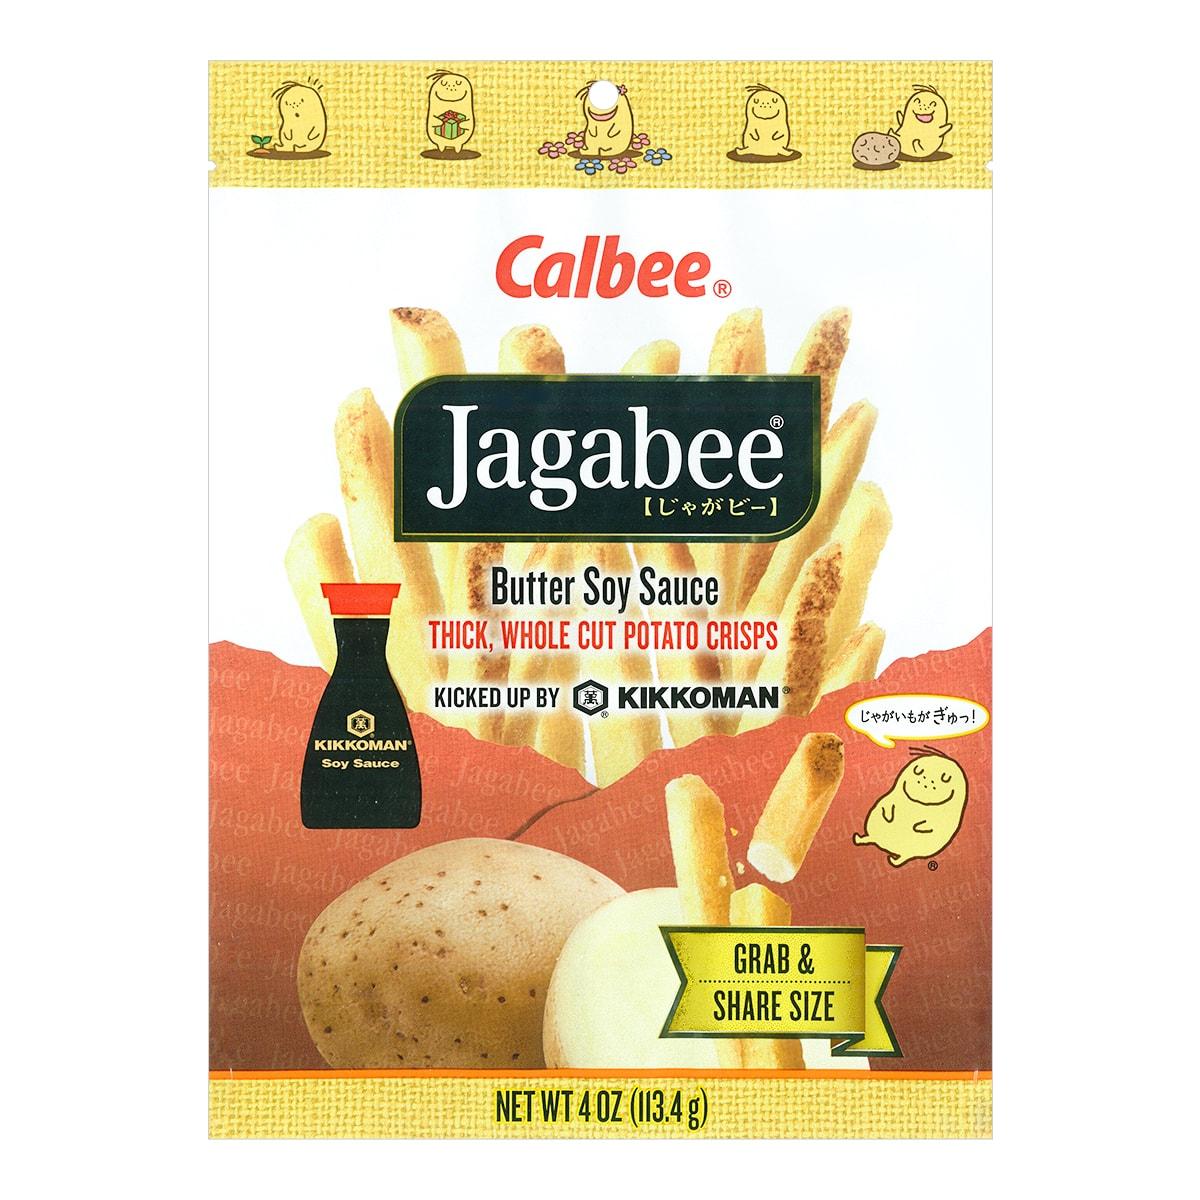 CALBEE Jagabee Buttery Soy Sauce Potato Sticks 113.4g